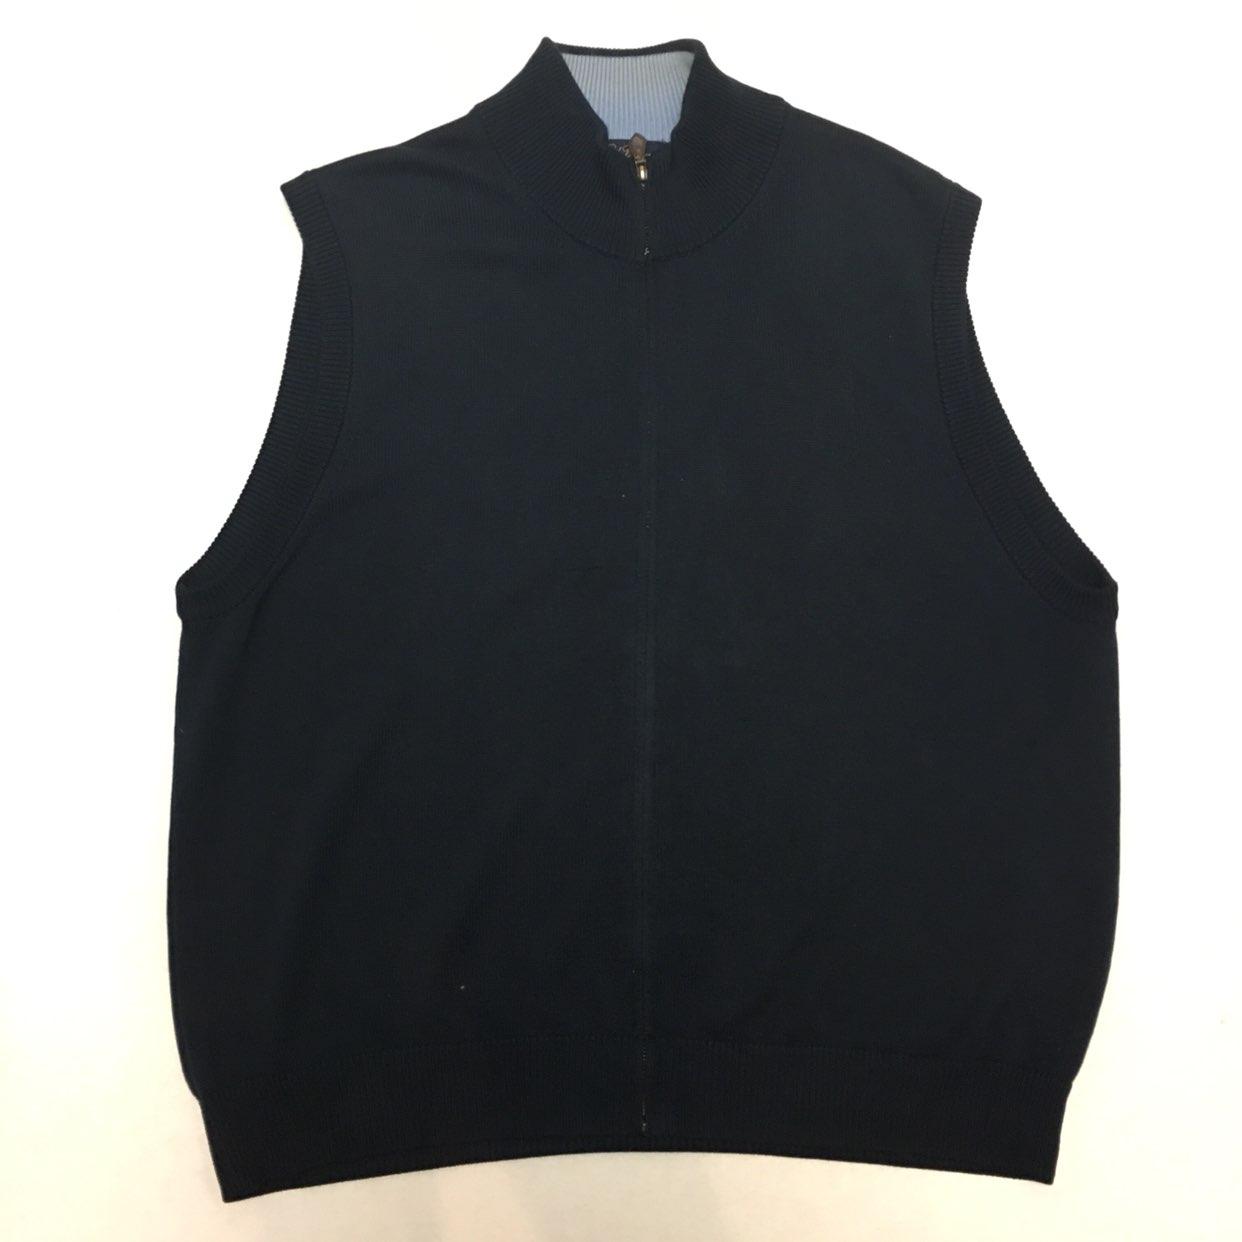 Men's Brooks Brothers Sweater Vest - Mercari: BUY & SELL THINGS ...